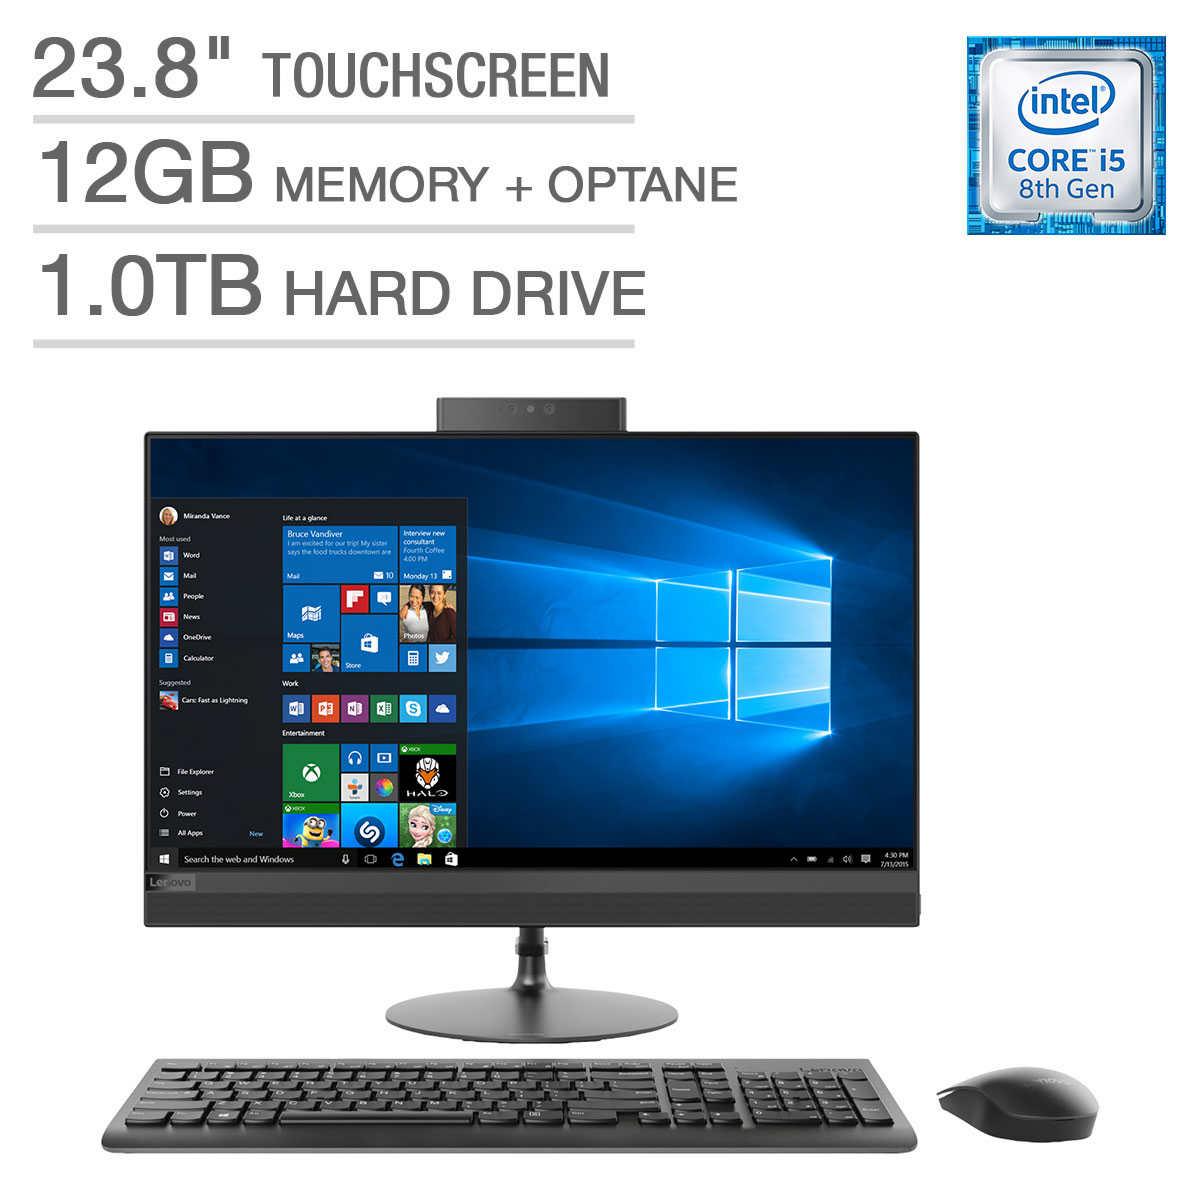 Lenovo IdeaCentre 520-24ICB Touchscreen All-in-One Desktop - Intel Core i5  - 1080p